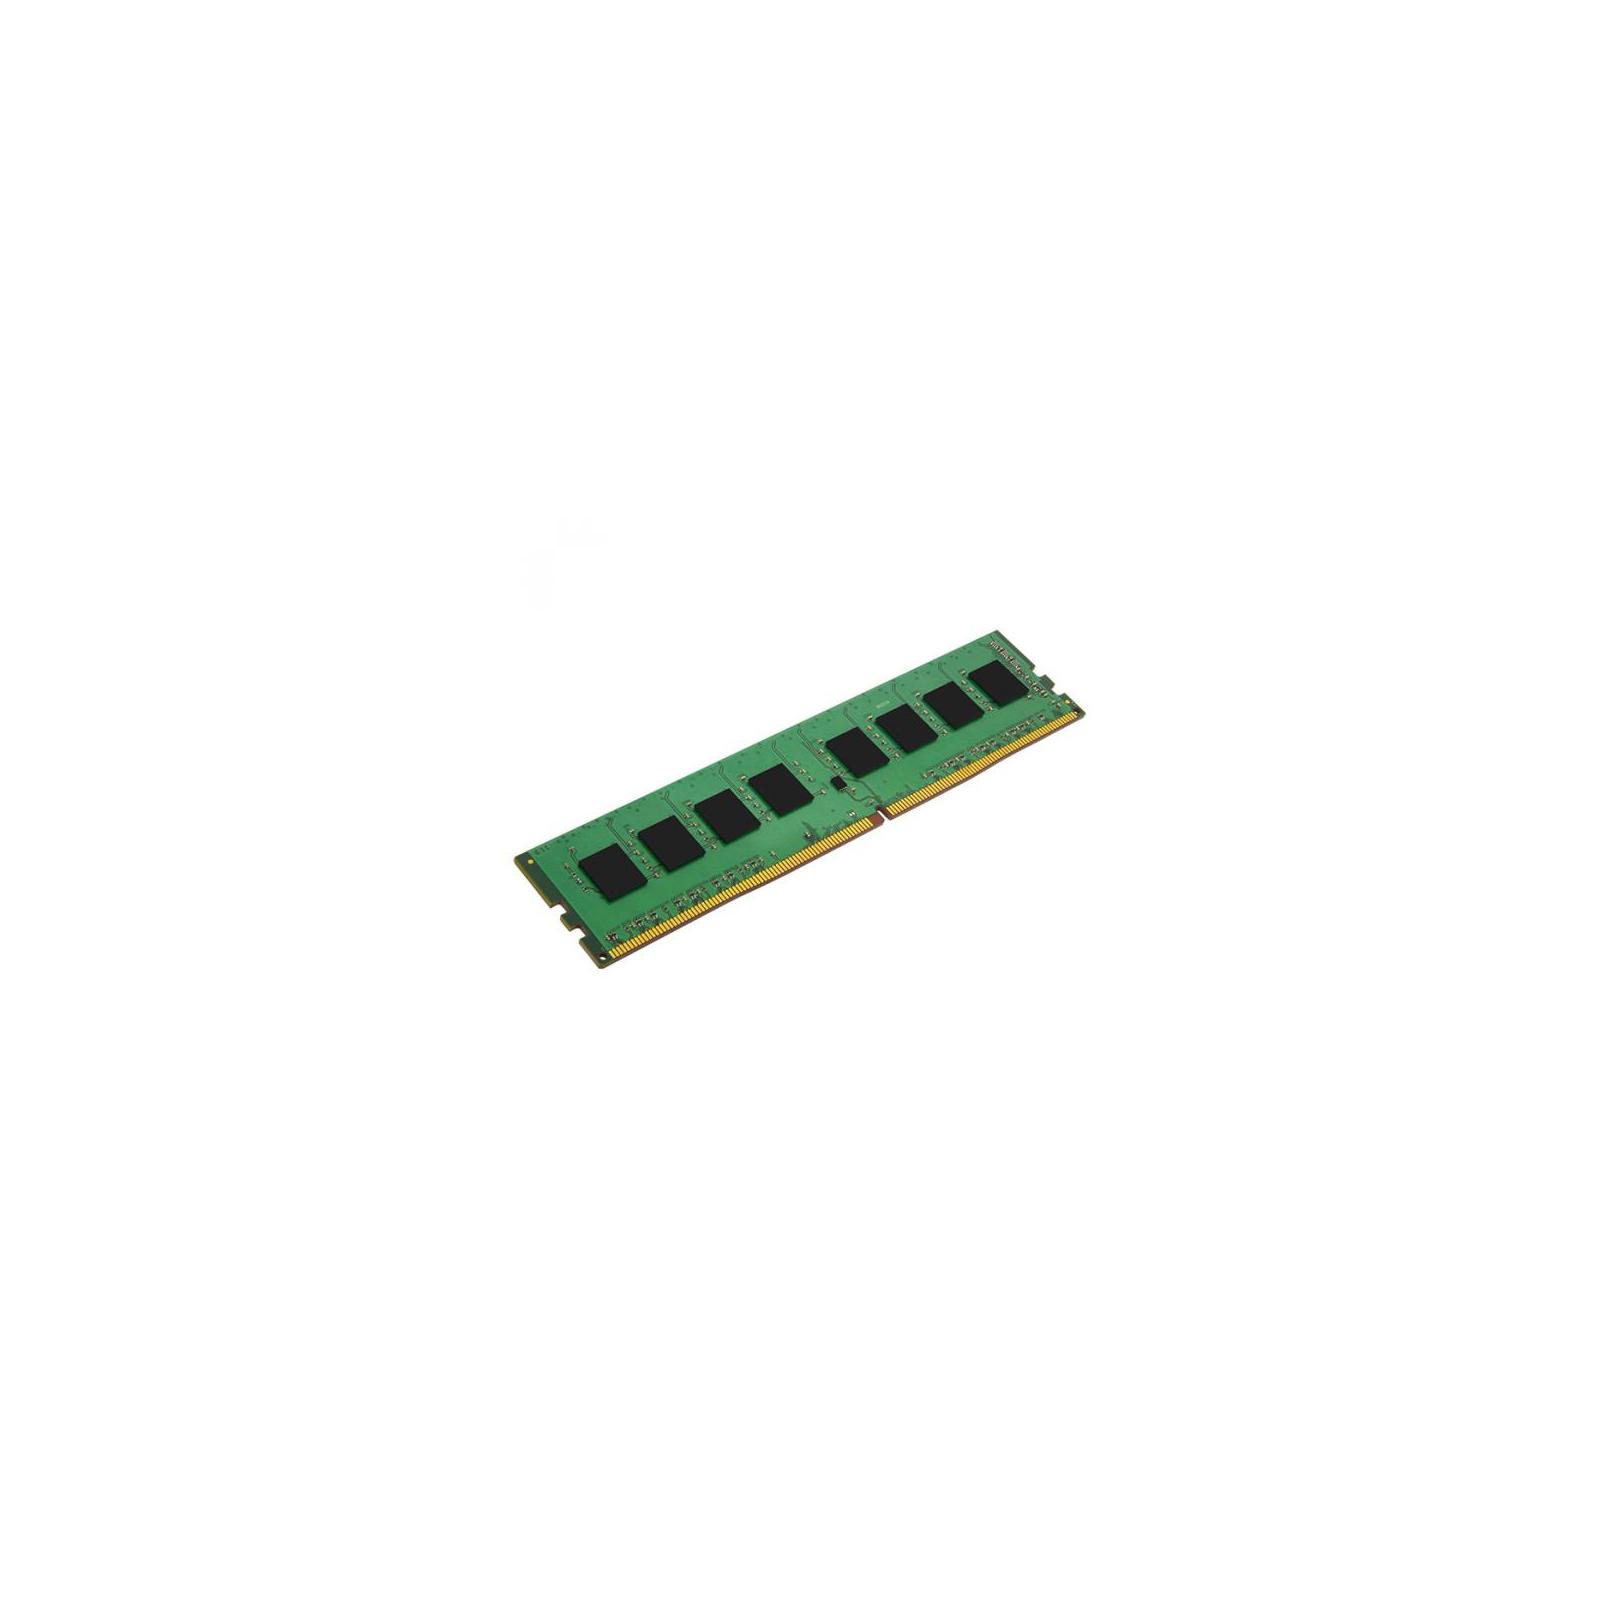 Модуль памяти для сервера DDR4 8GB ECC UDIMM 2400MHz 1Rx8 1.2V CL17 Kingston (KTD-PE424E/8G)